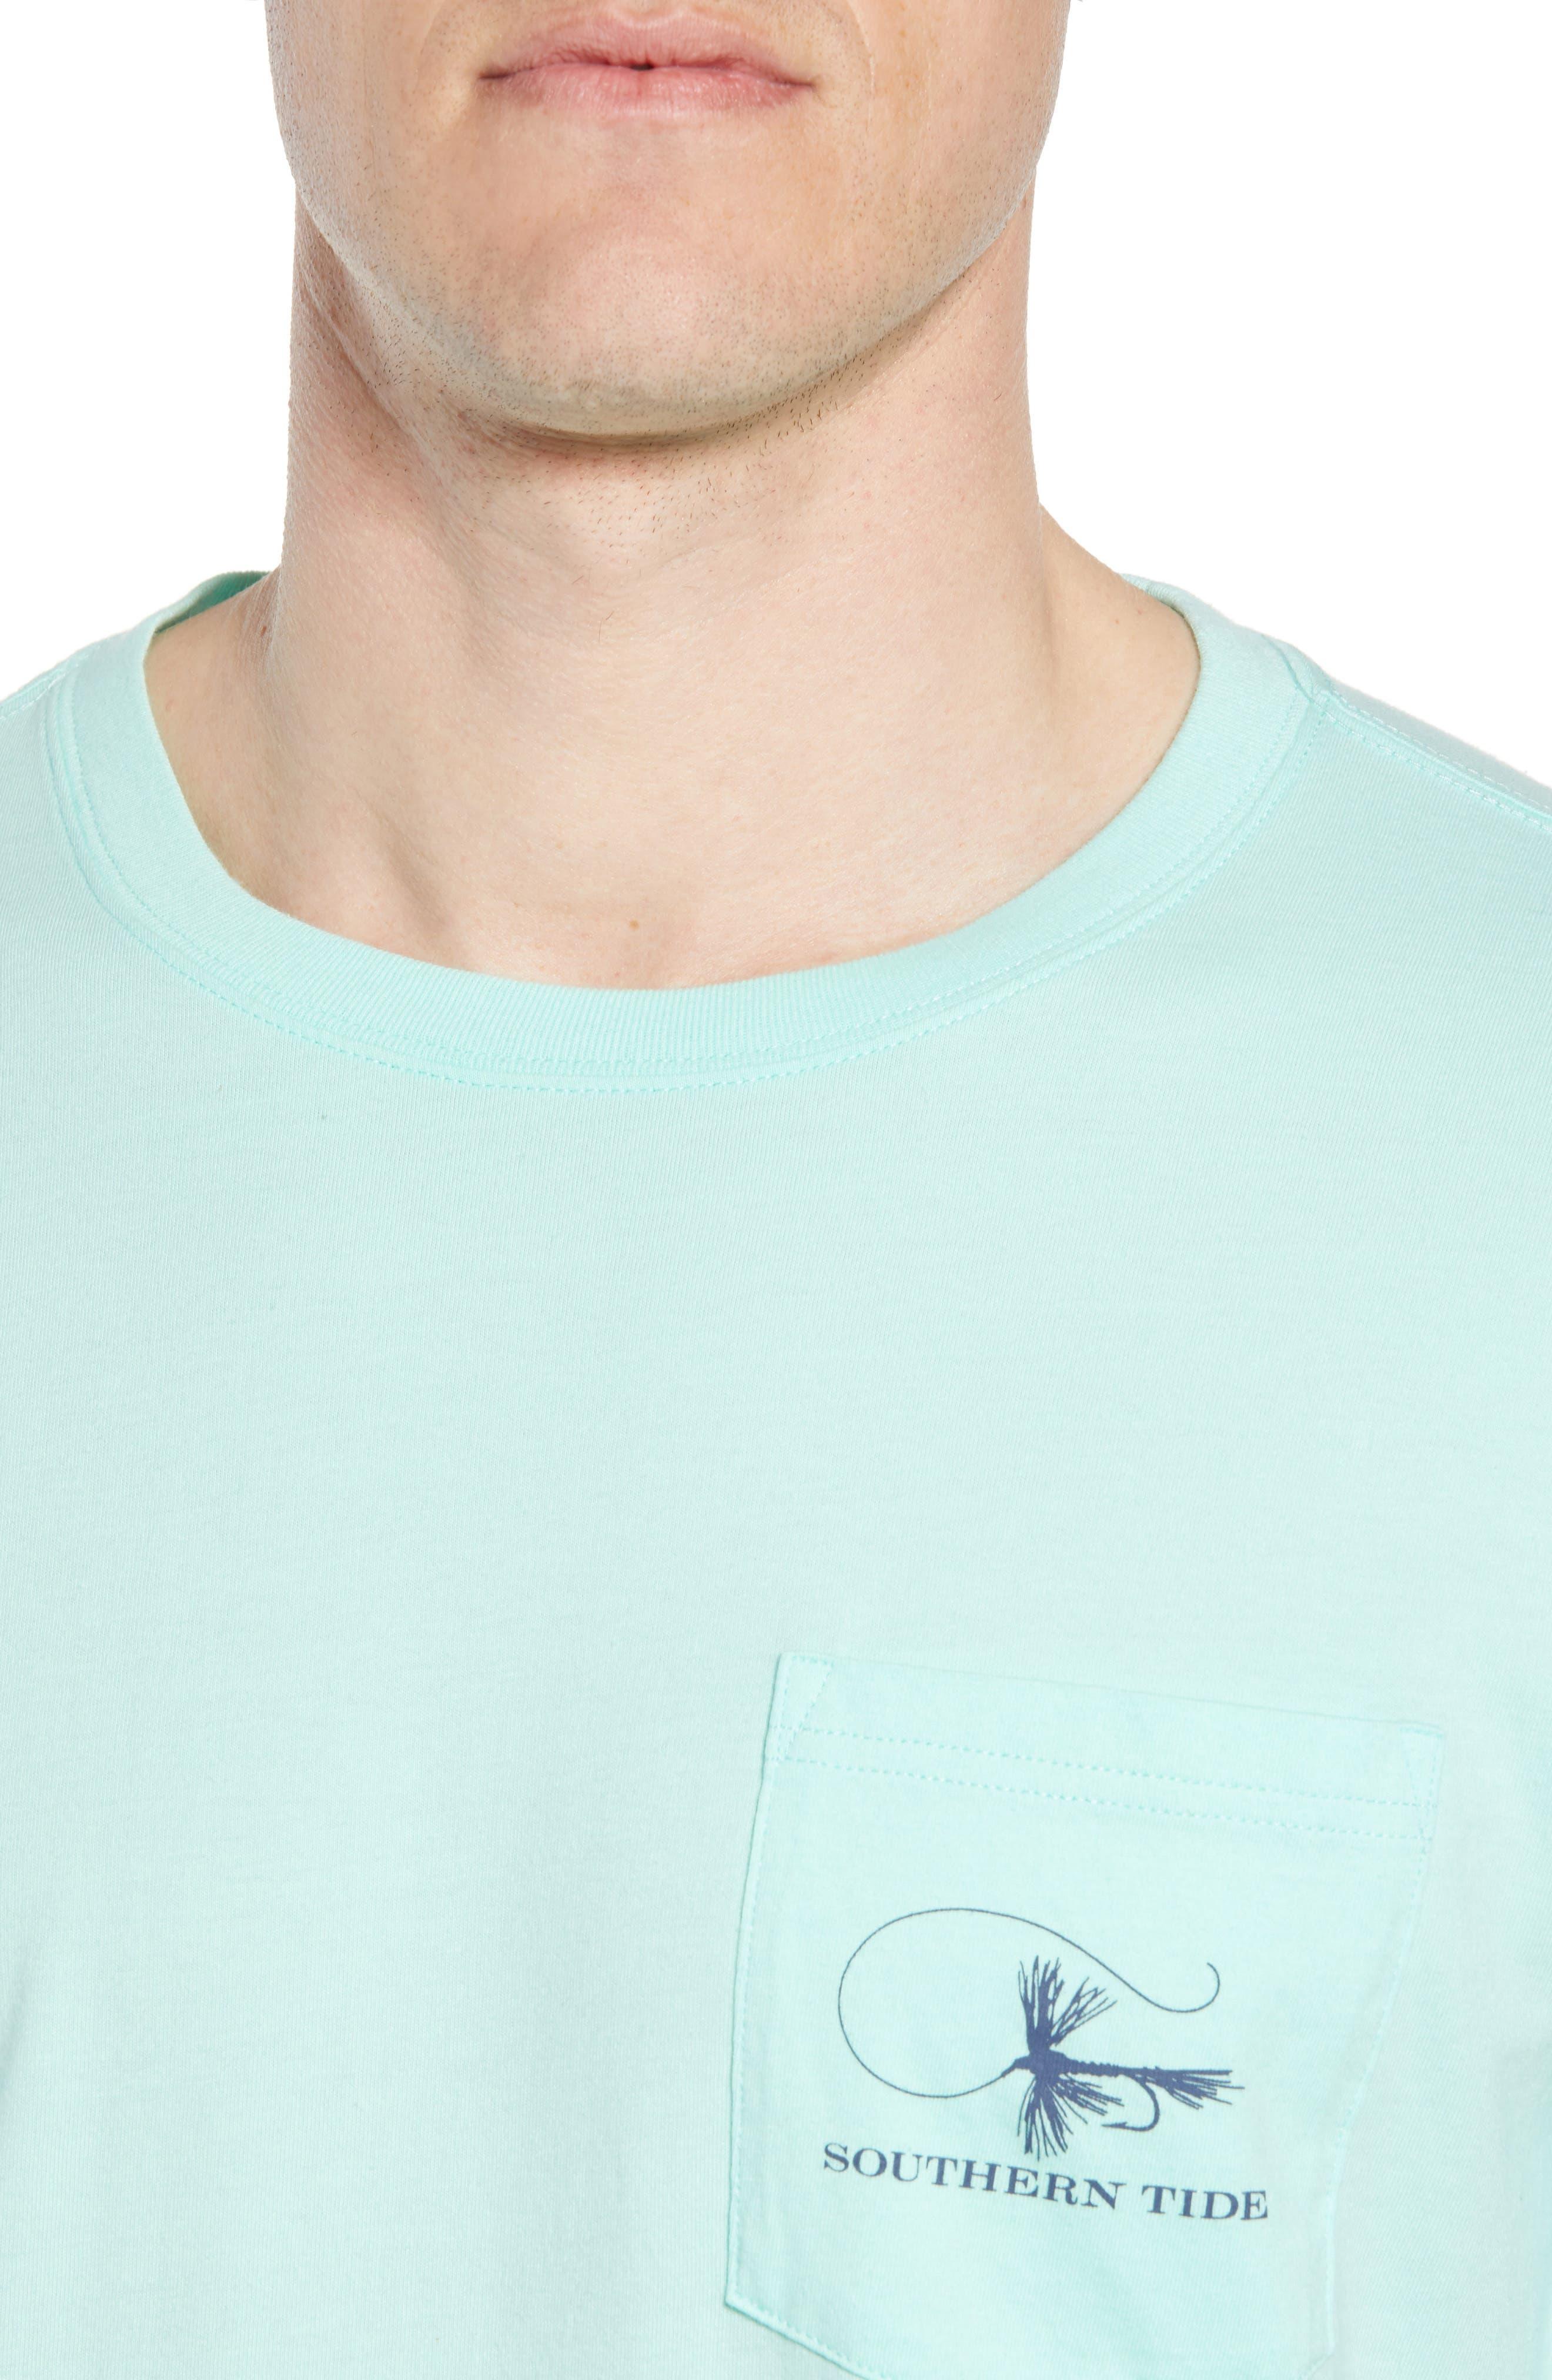 Fly Fishing Regular Fit Pocket T-Shirt,                             Alternate thumbnail 4, color,                             376